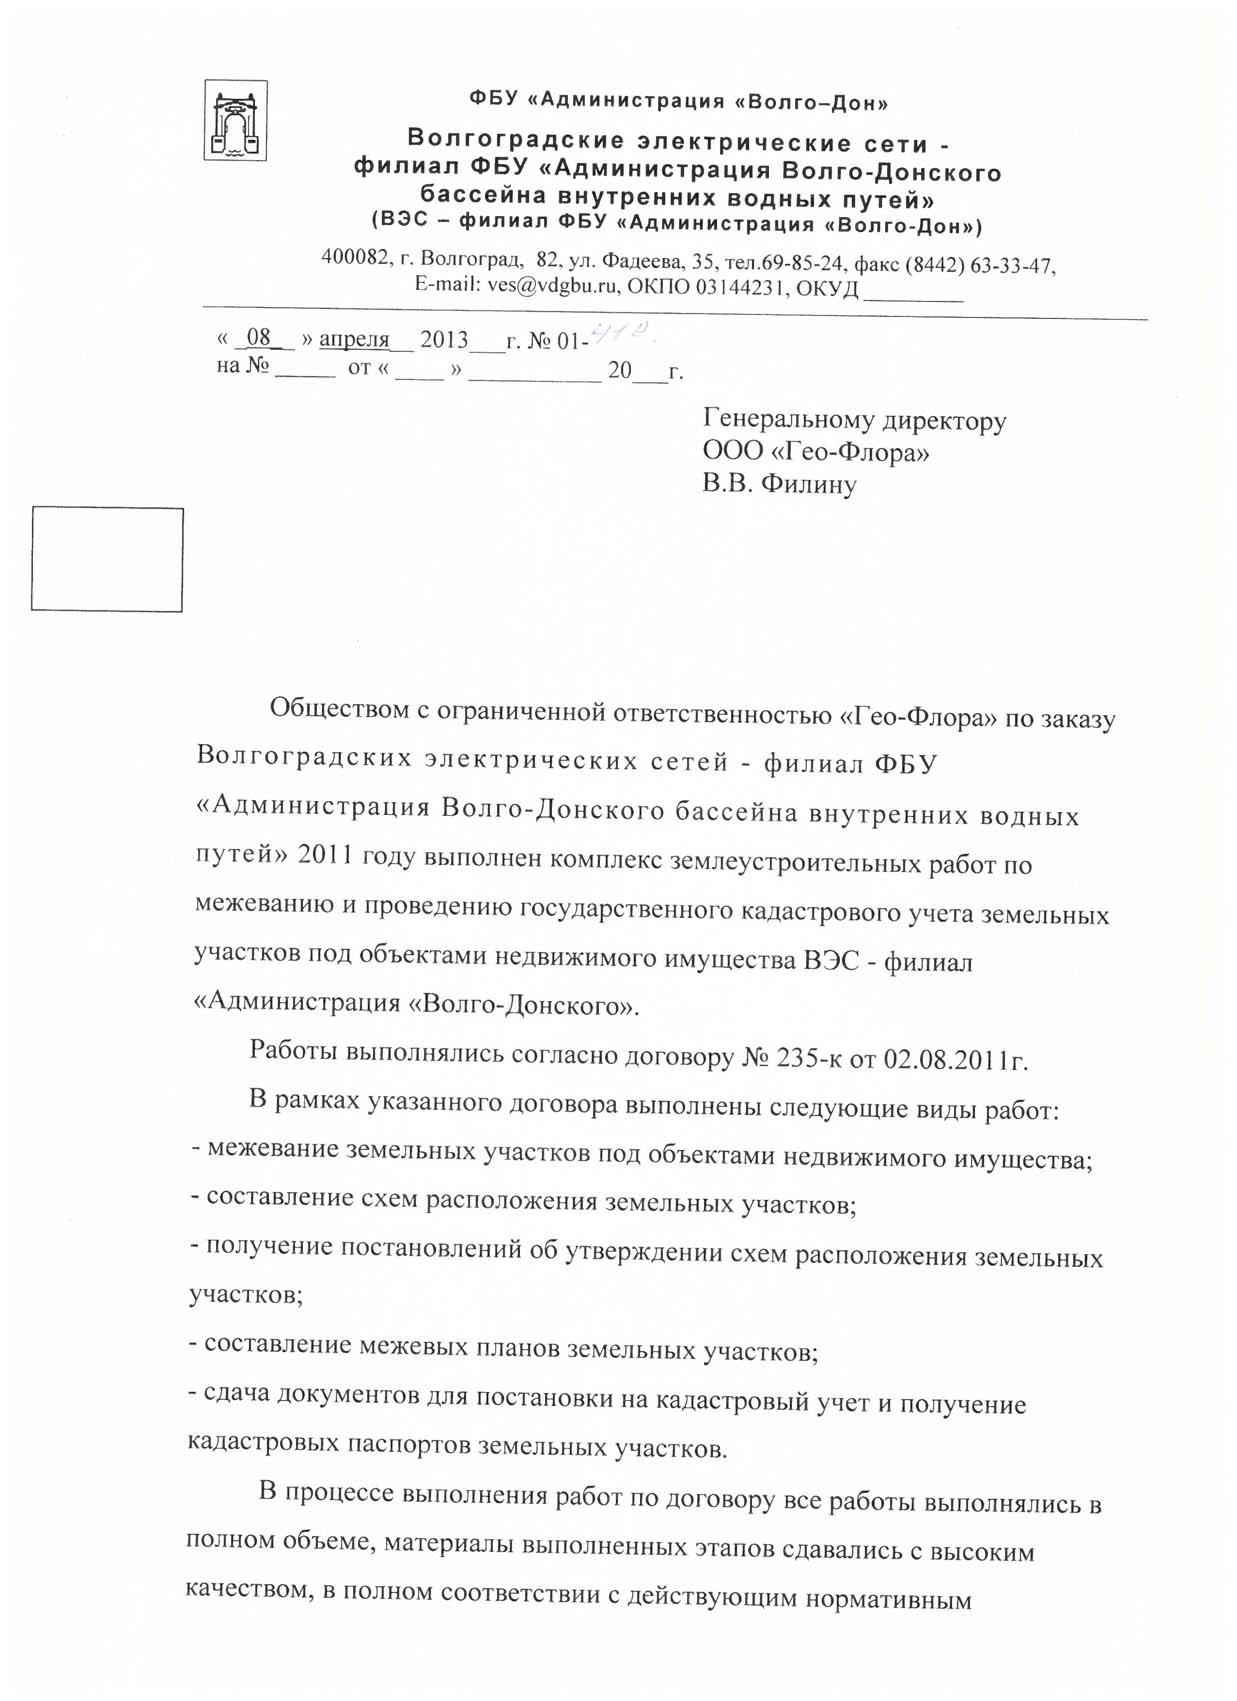 ФБУ Администрация Волго-Дон